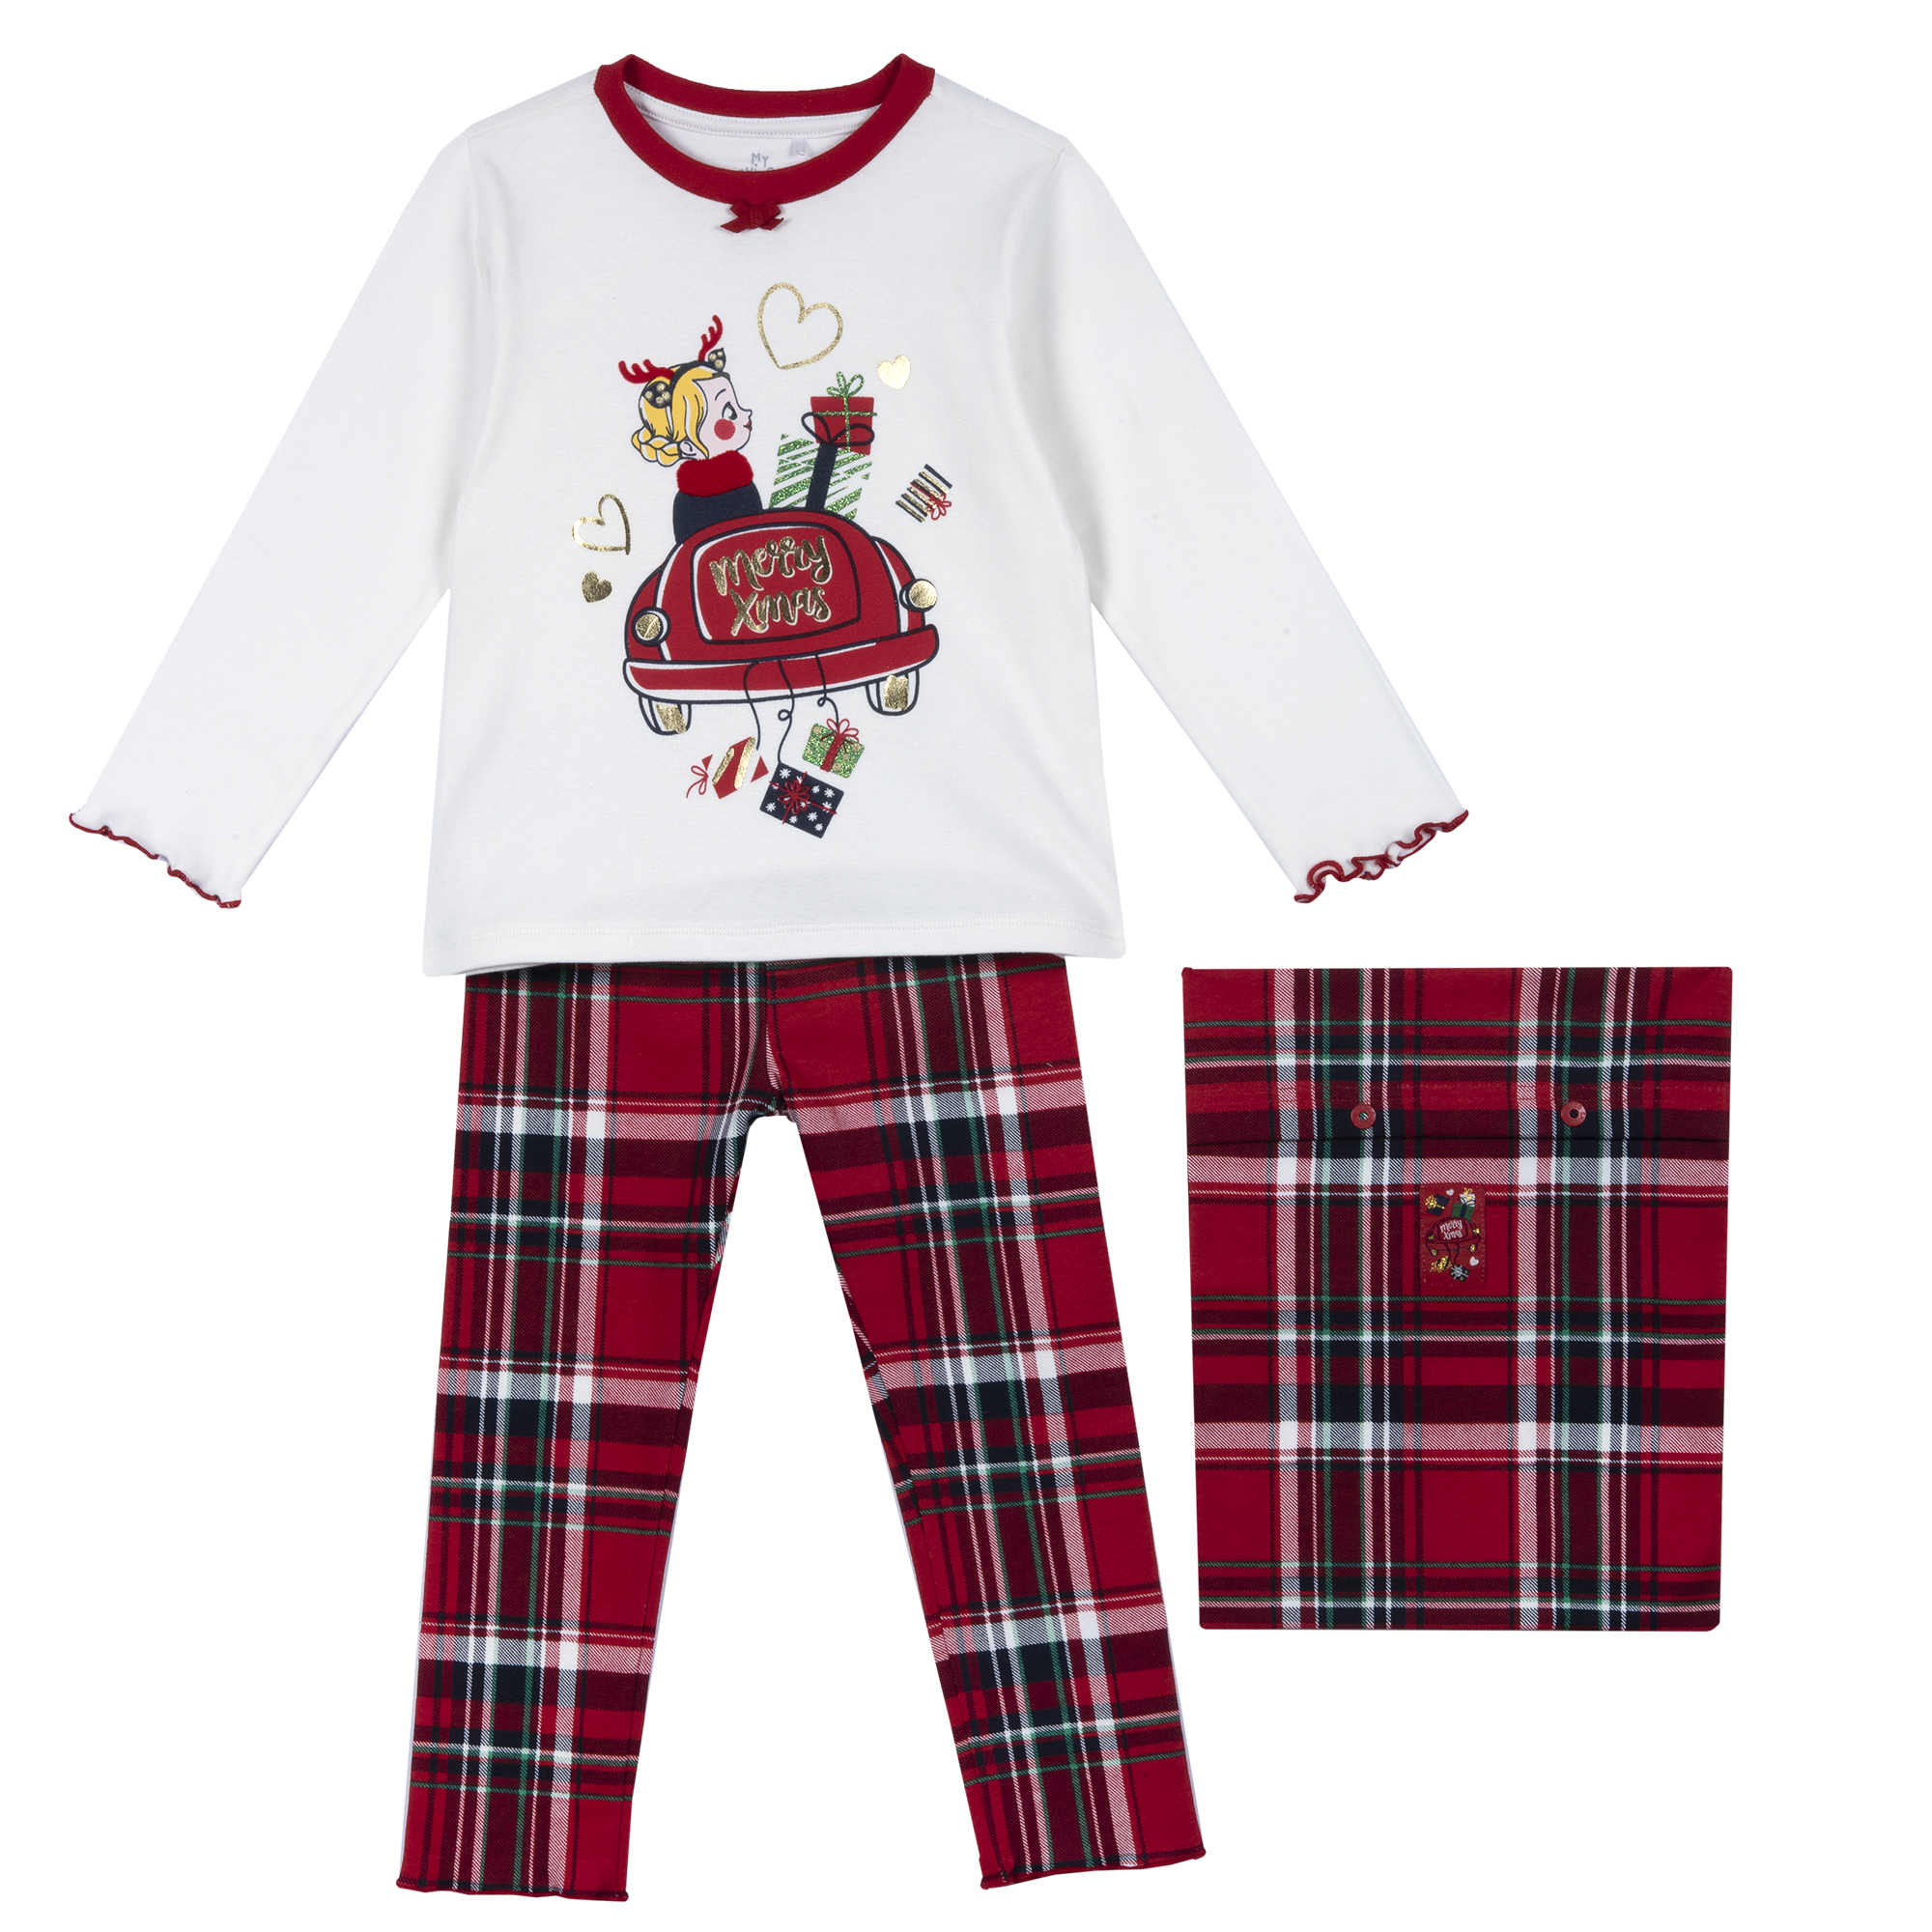 Pijama Copii Chicco, Bluza Si Pantaloni, Rosu, 31327 imagine